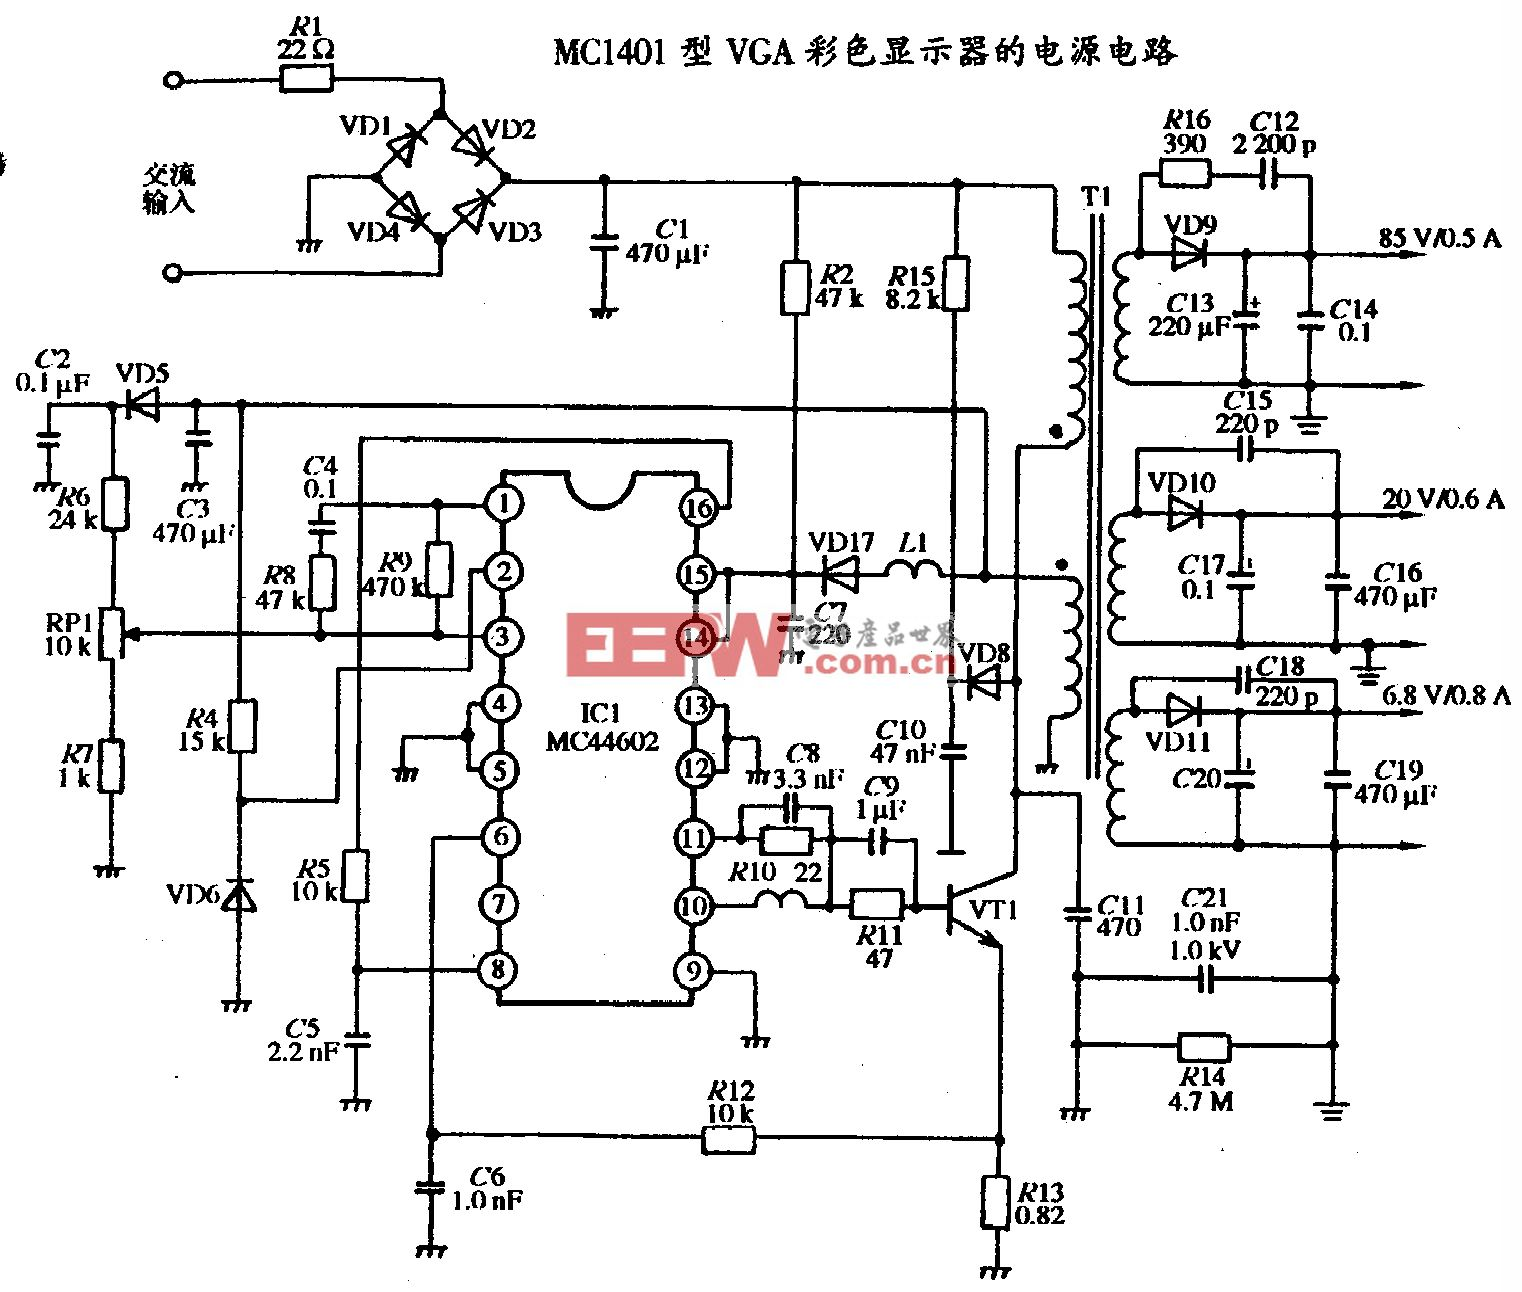 MC1401型VGA彩色显示器的电源电路图